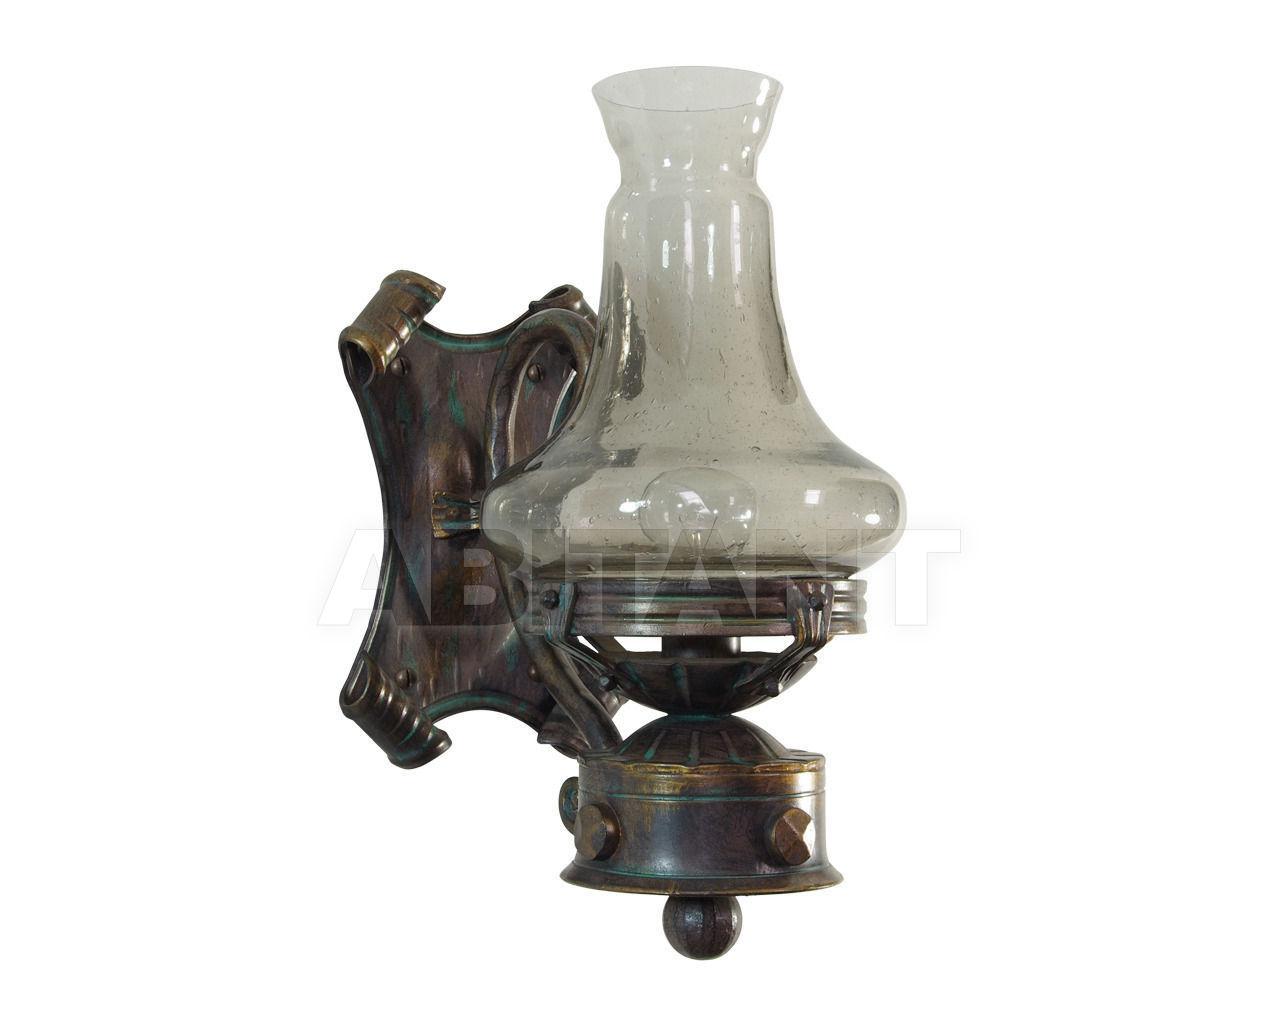 Купить Светильник настенный FMB Leuchten Schmiedeeisen Lampen Und Leuchten 94092